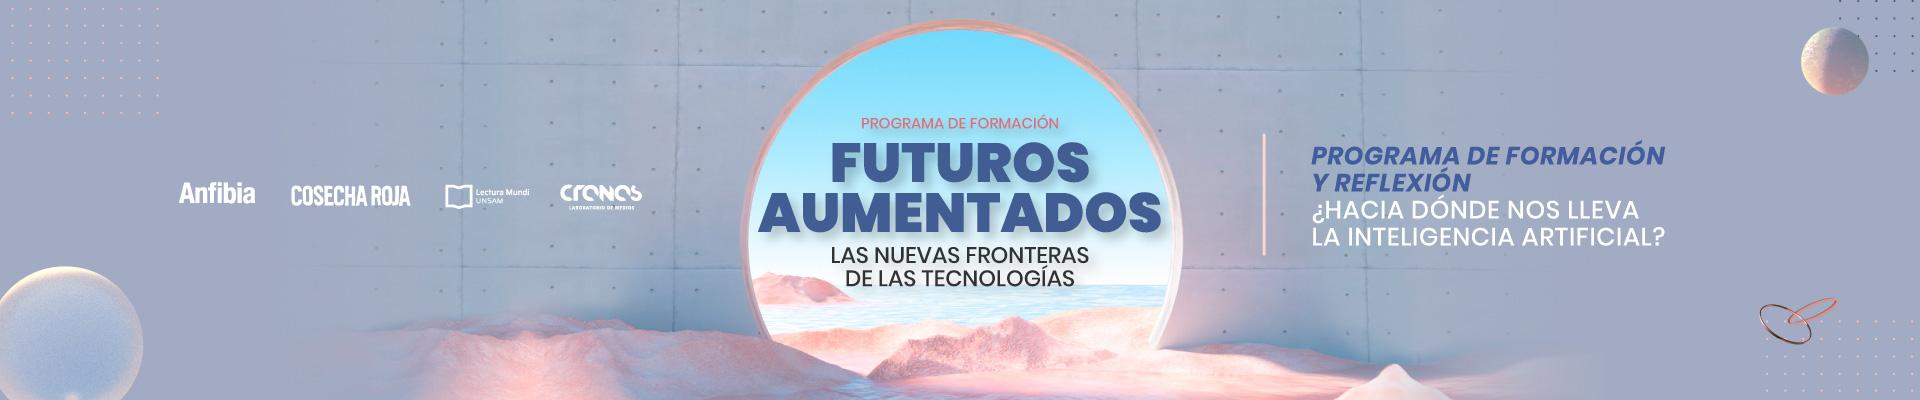 FUTUROS-AUMENTADOS_Banners_WEB_1920x400